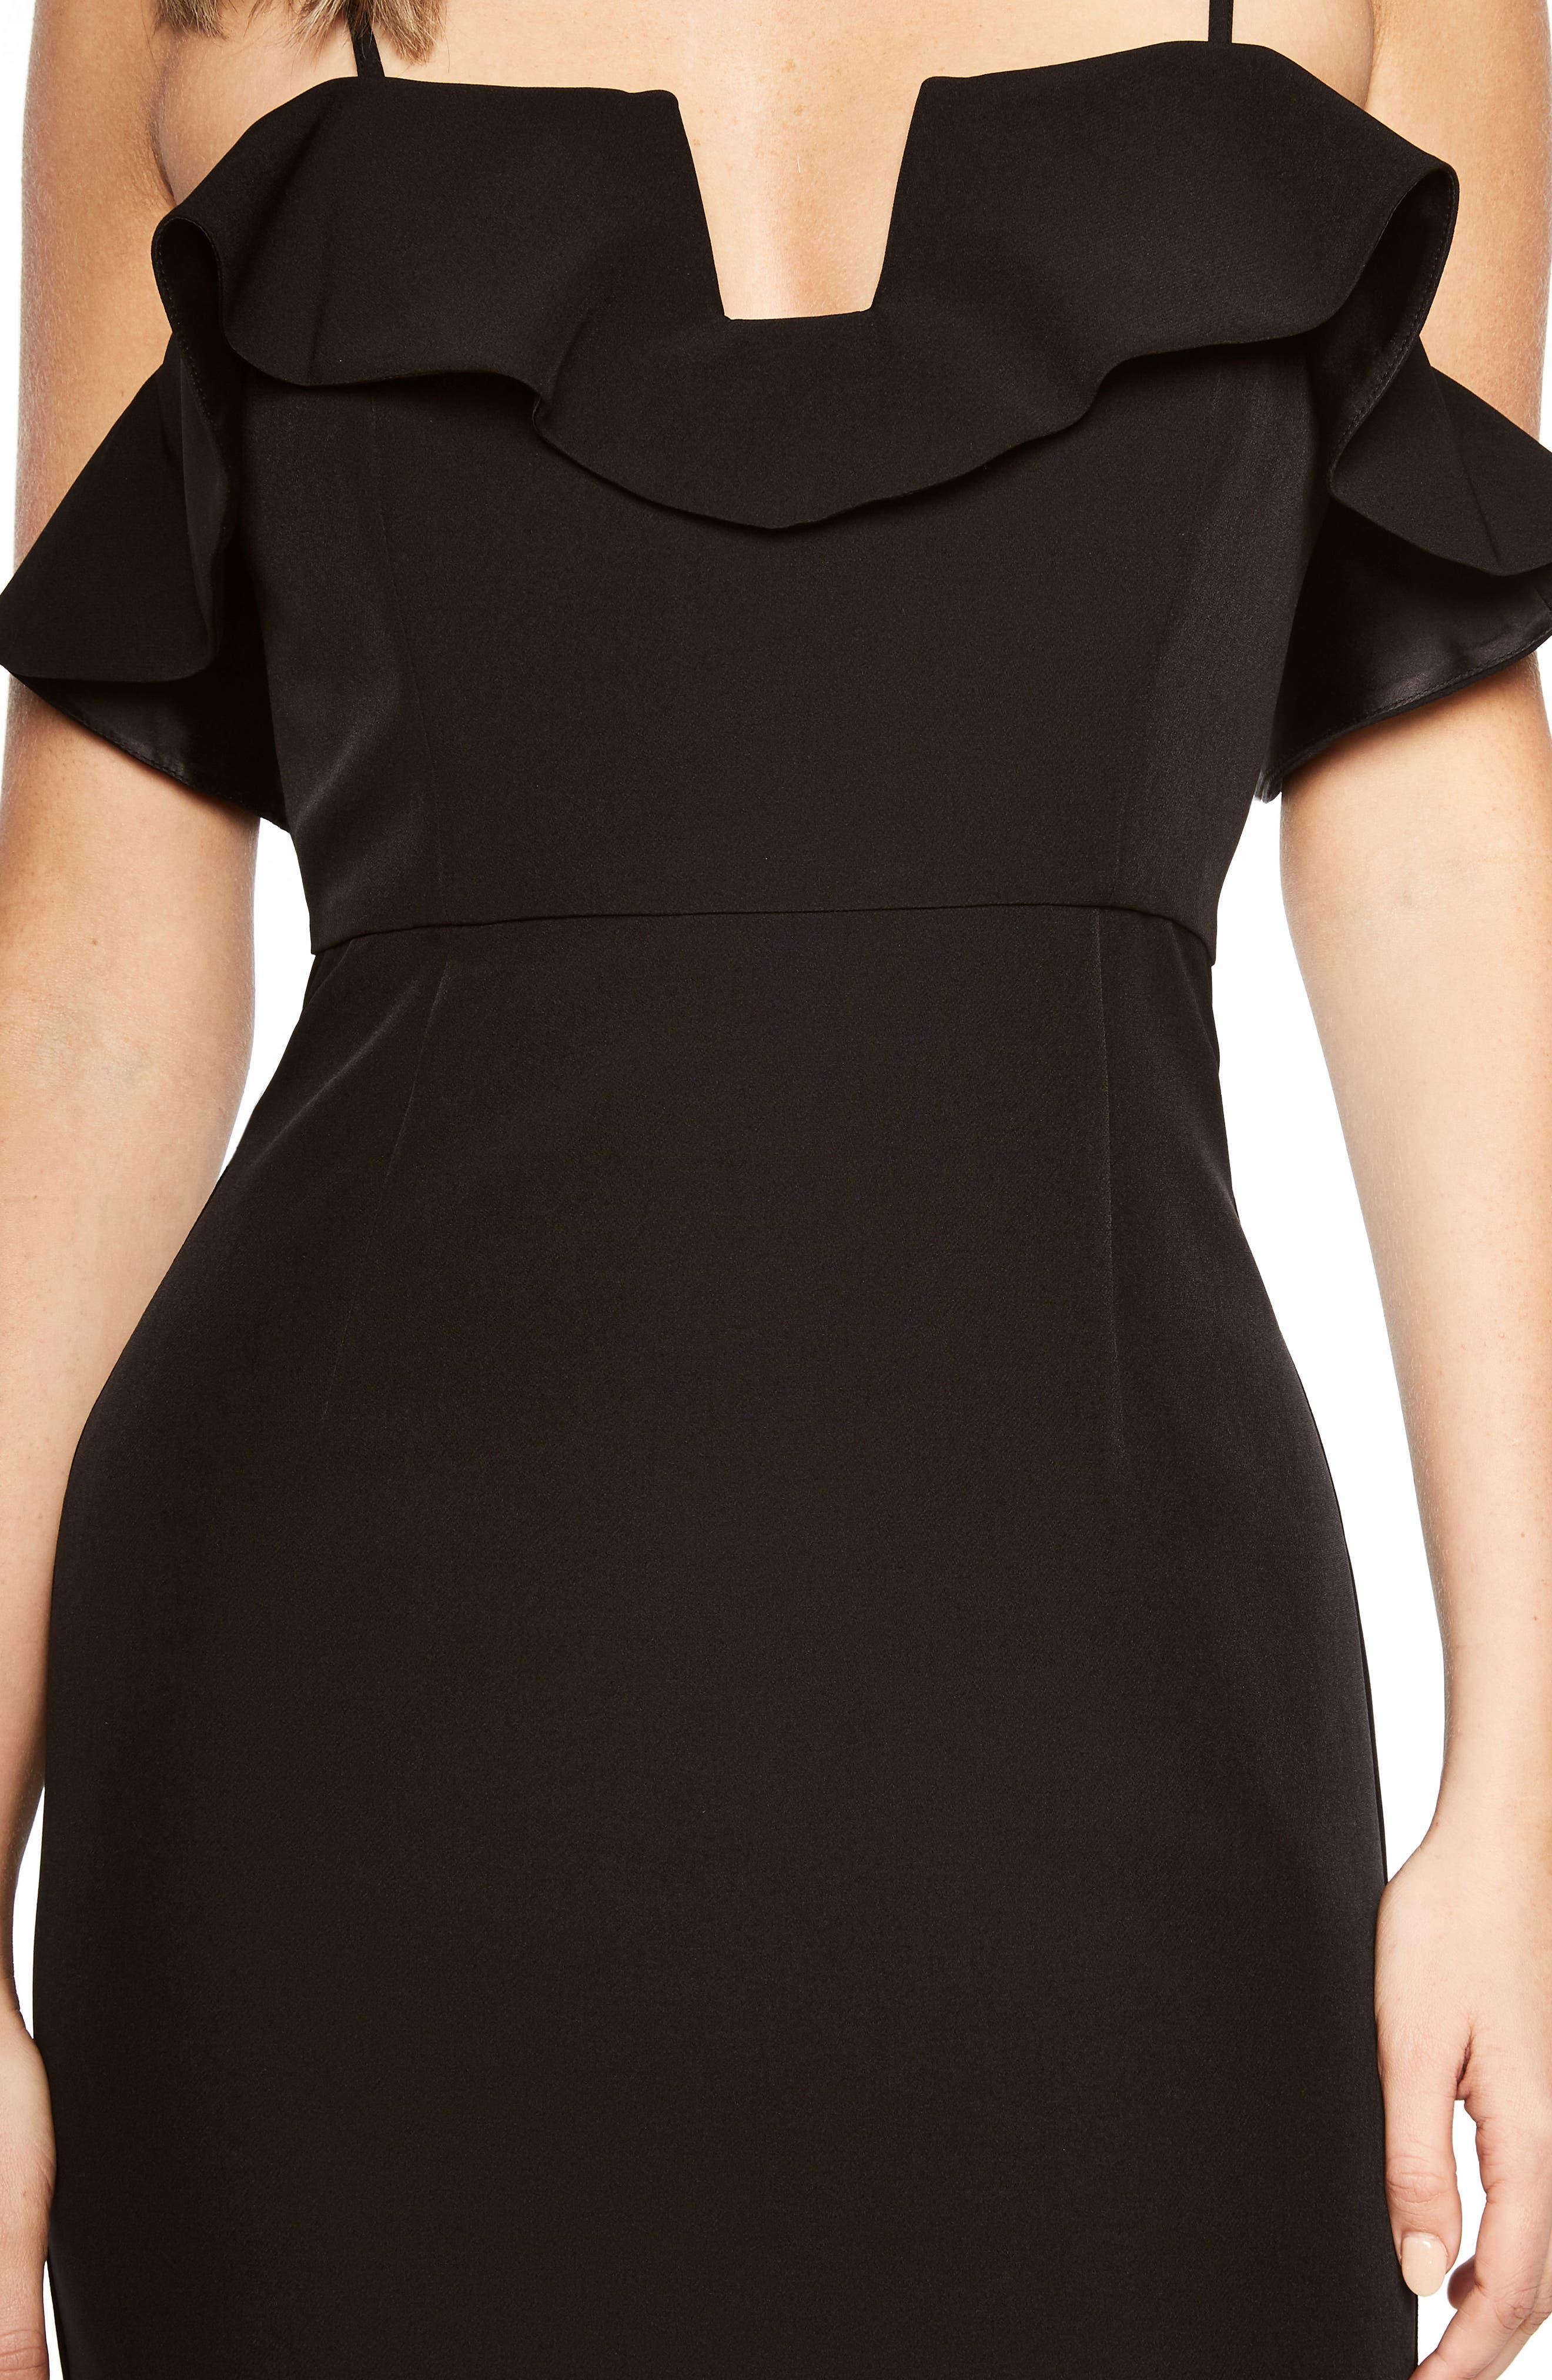 Karen Ruffled Sheath Dress,                             Alternate thumbnail 4, color,                             001